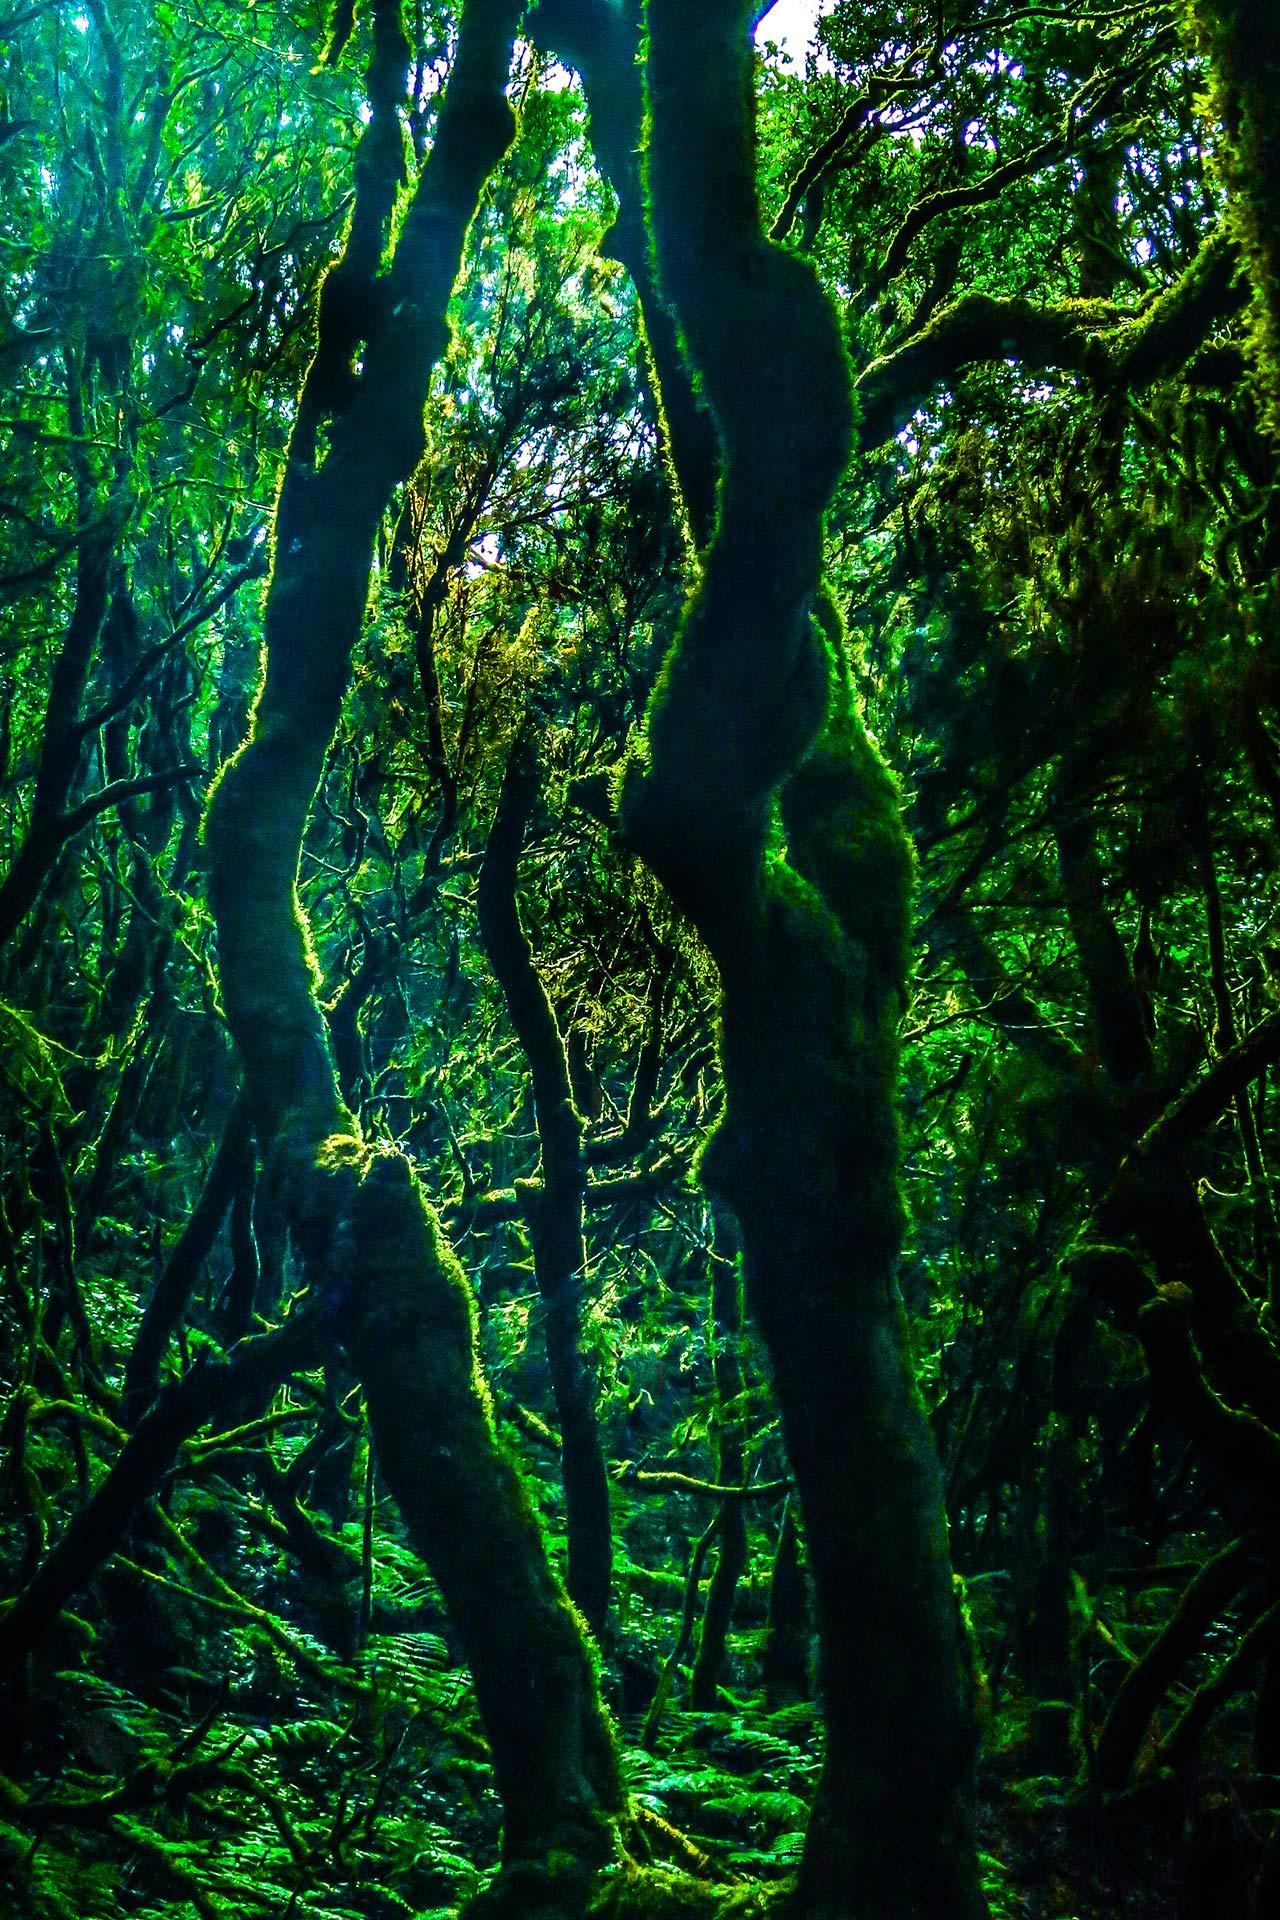 Landschaftsfotografie - Wald auf La Palma